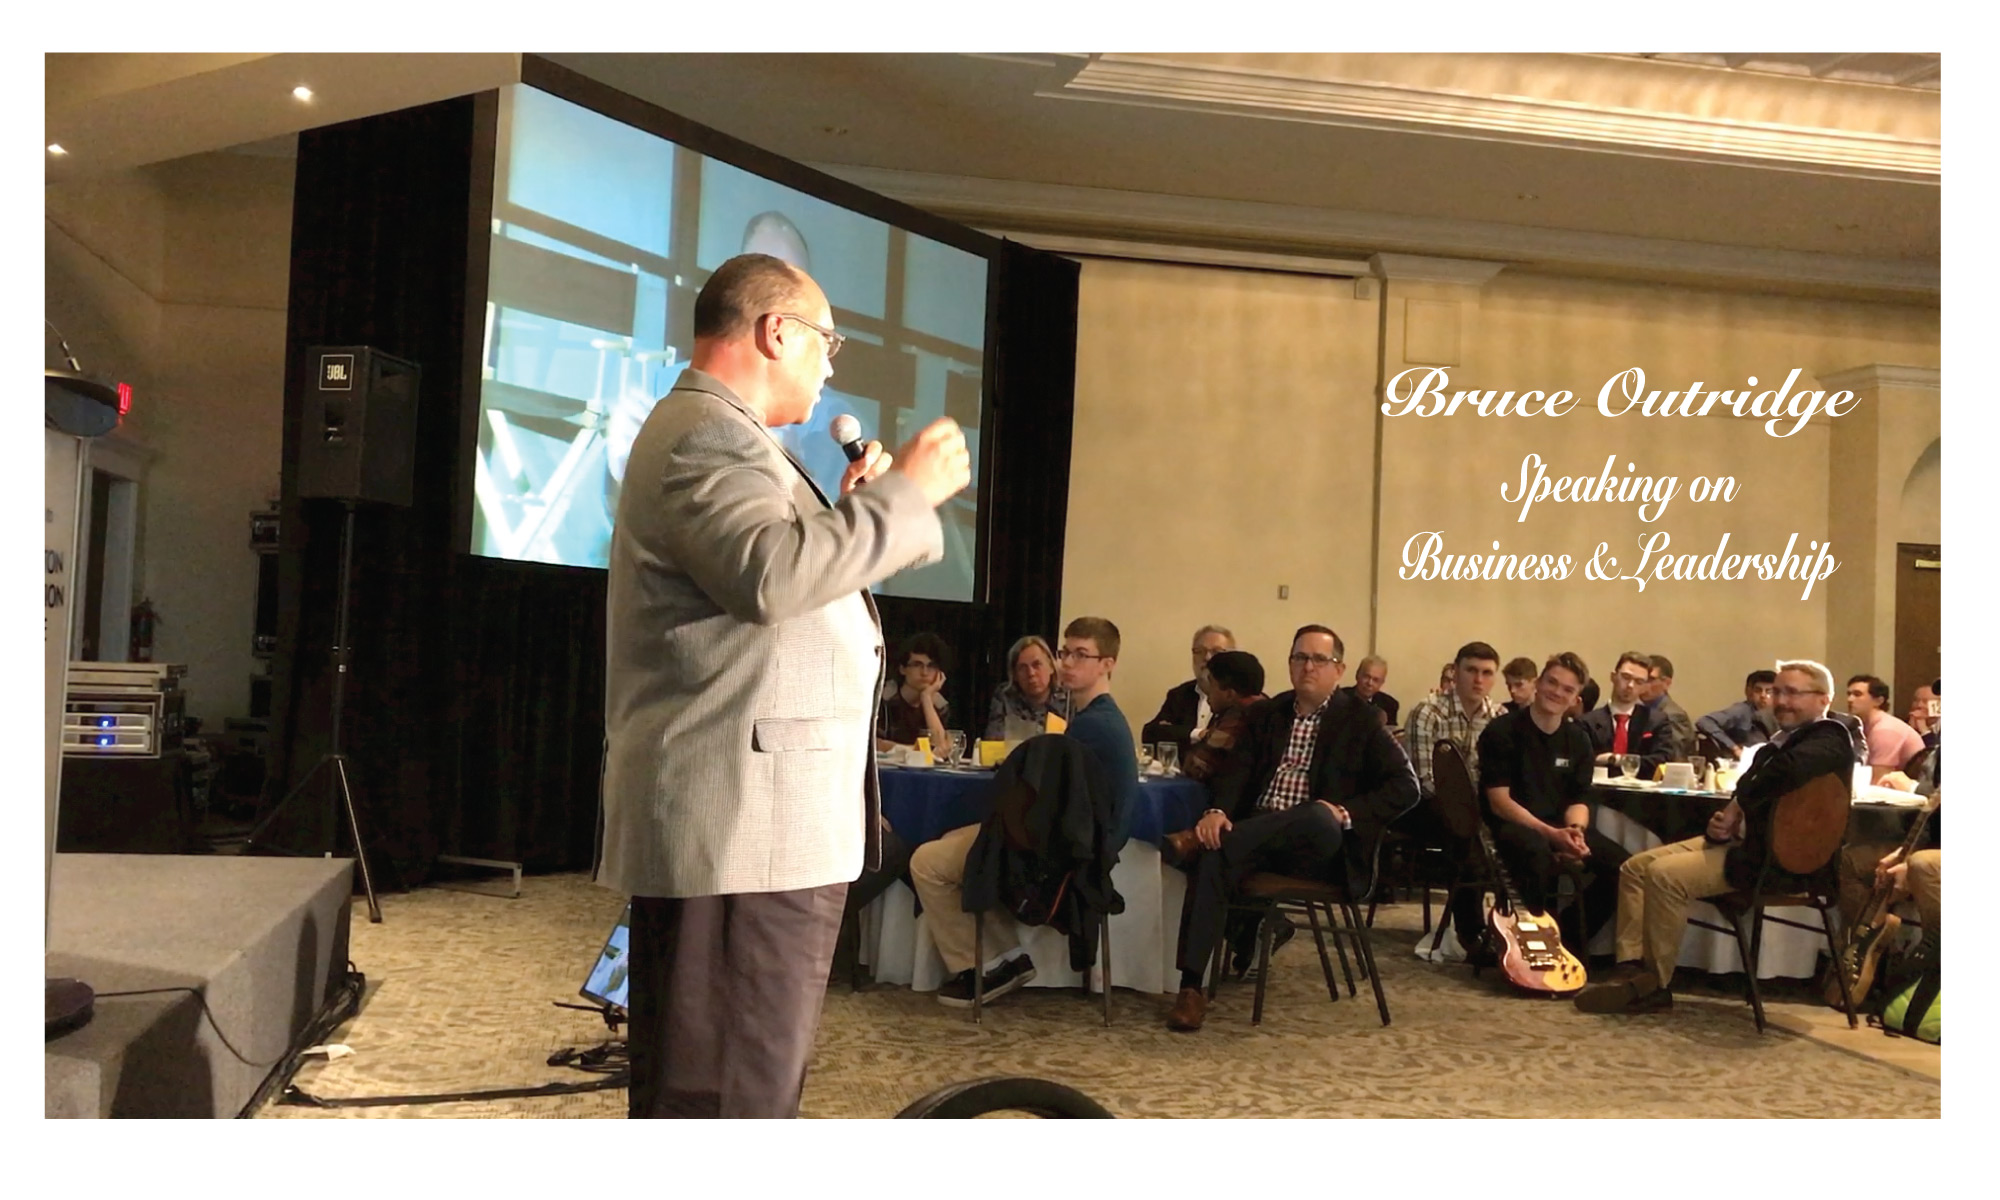 Bruce Outridge Speaking